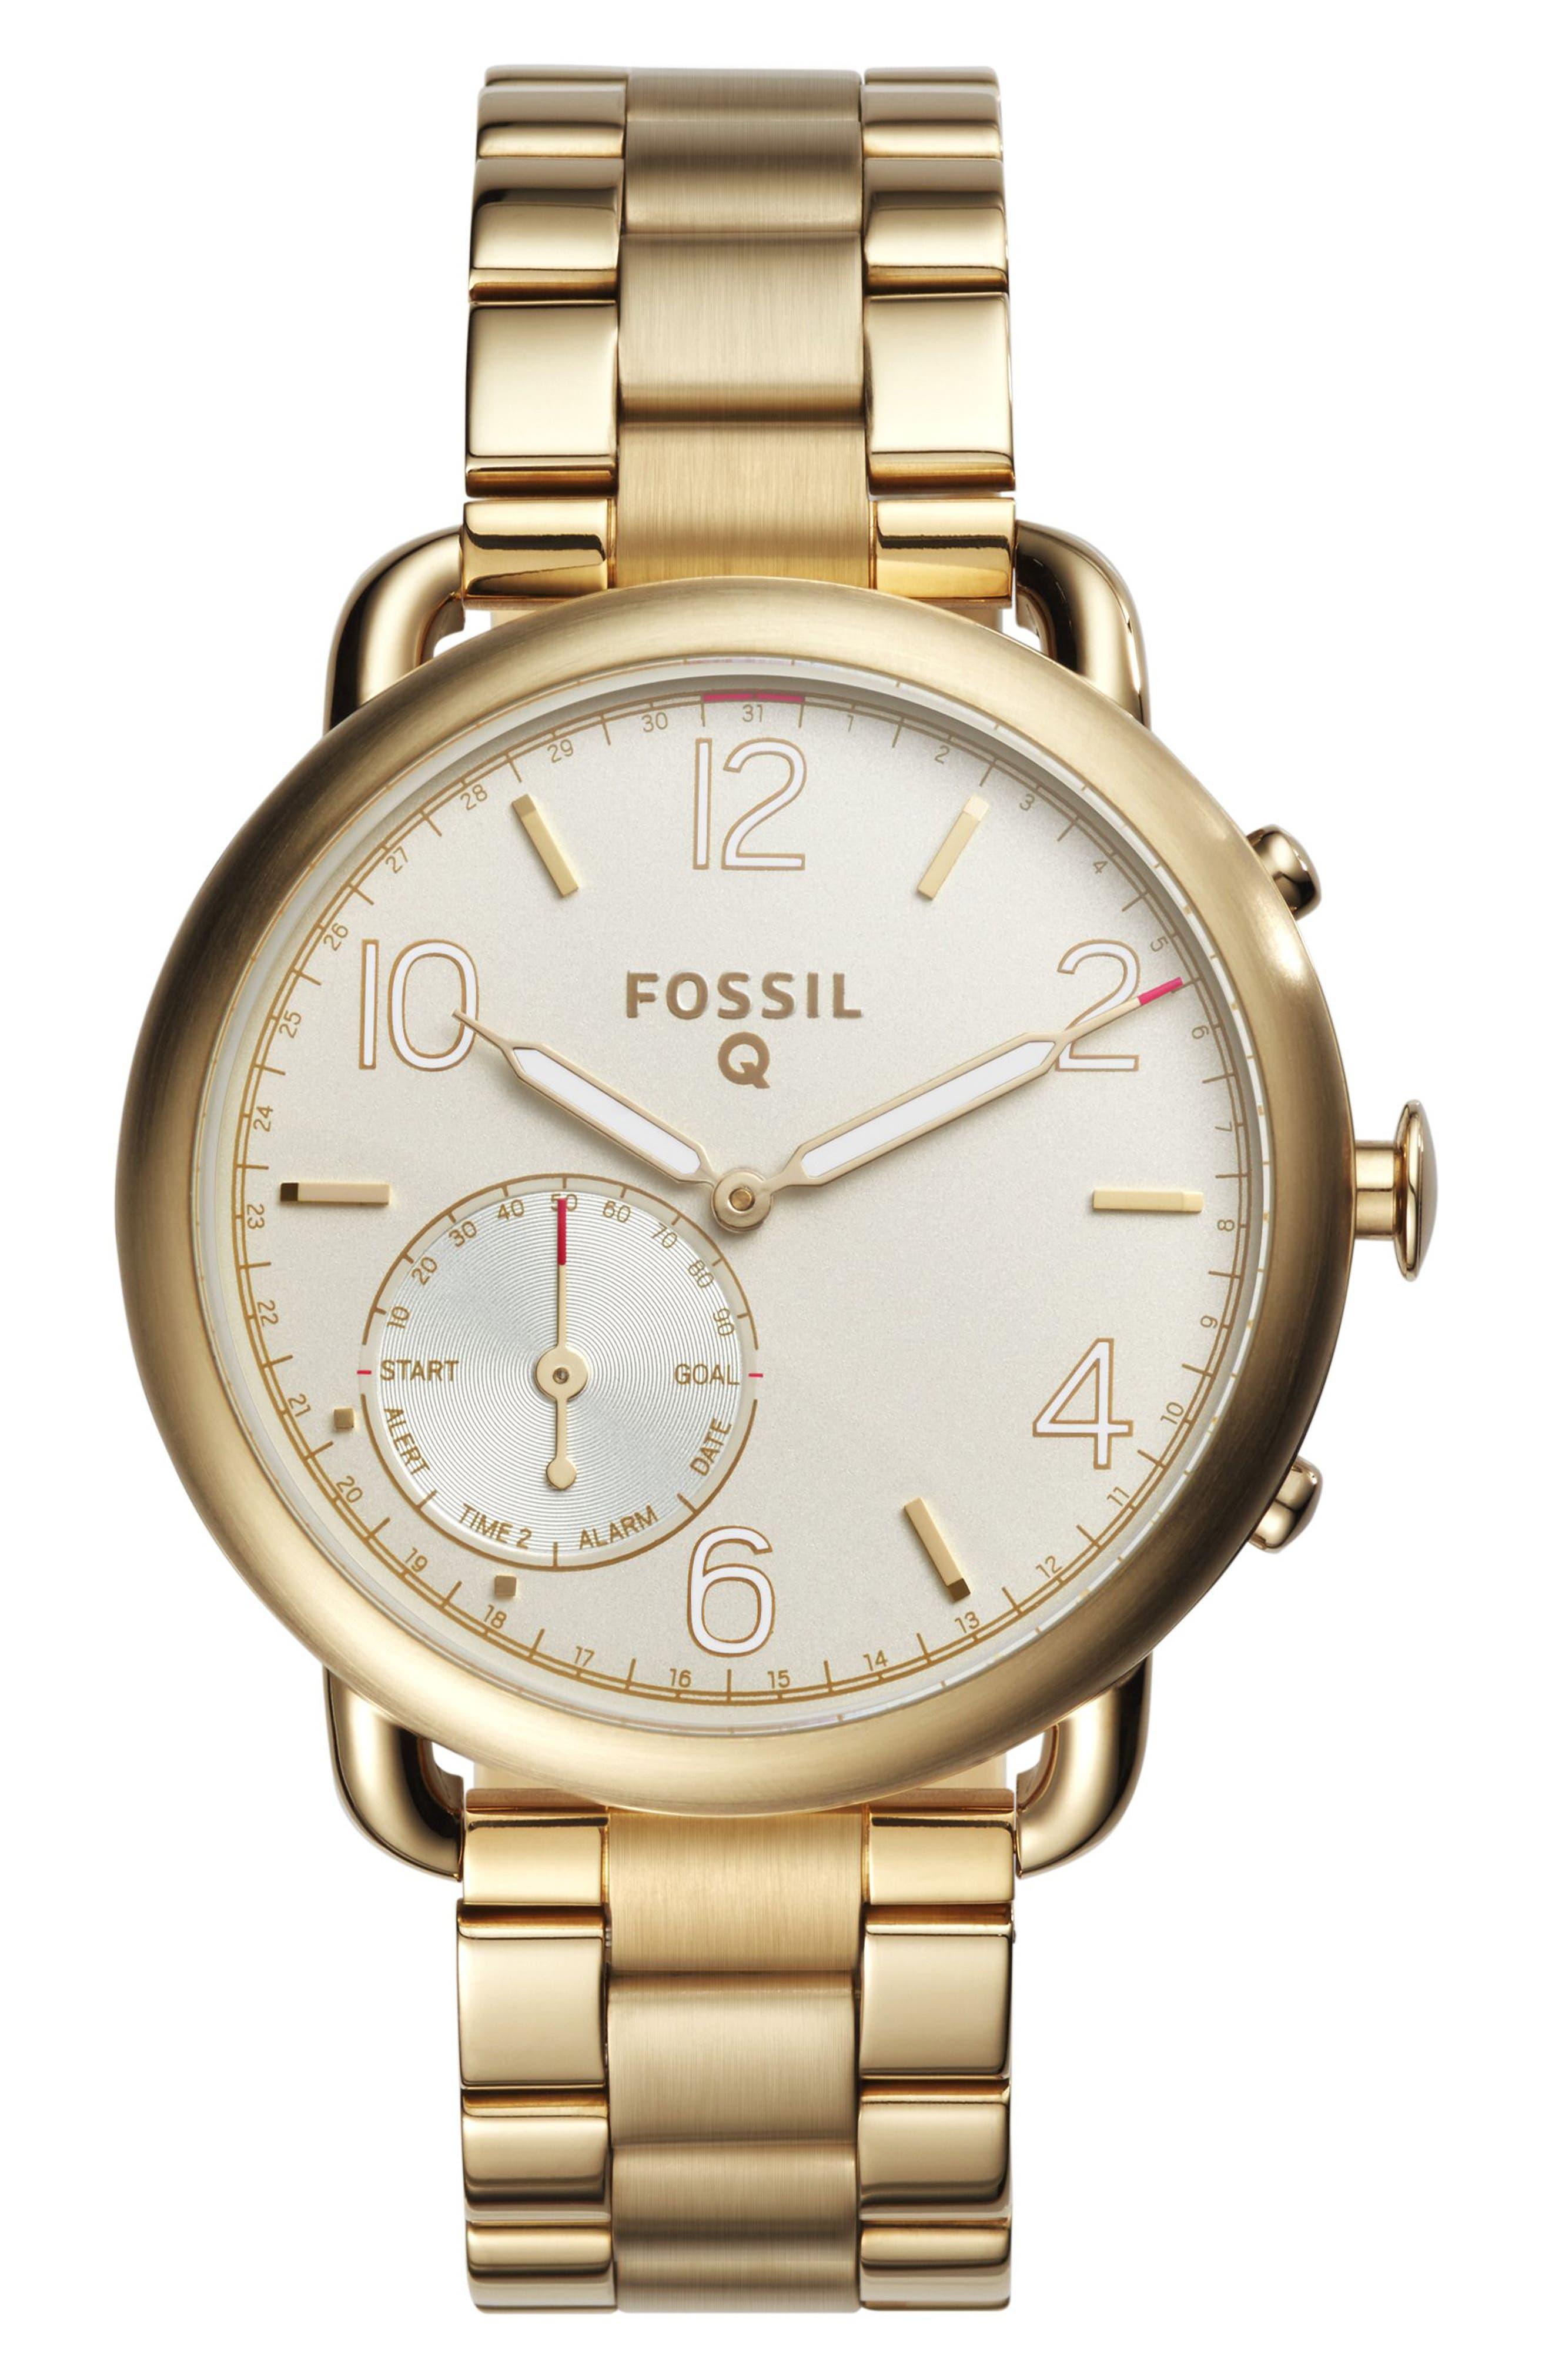 Main Image - Fossil Q Tailor Smart Bracelet Watch, 40mm